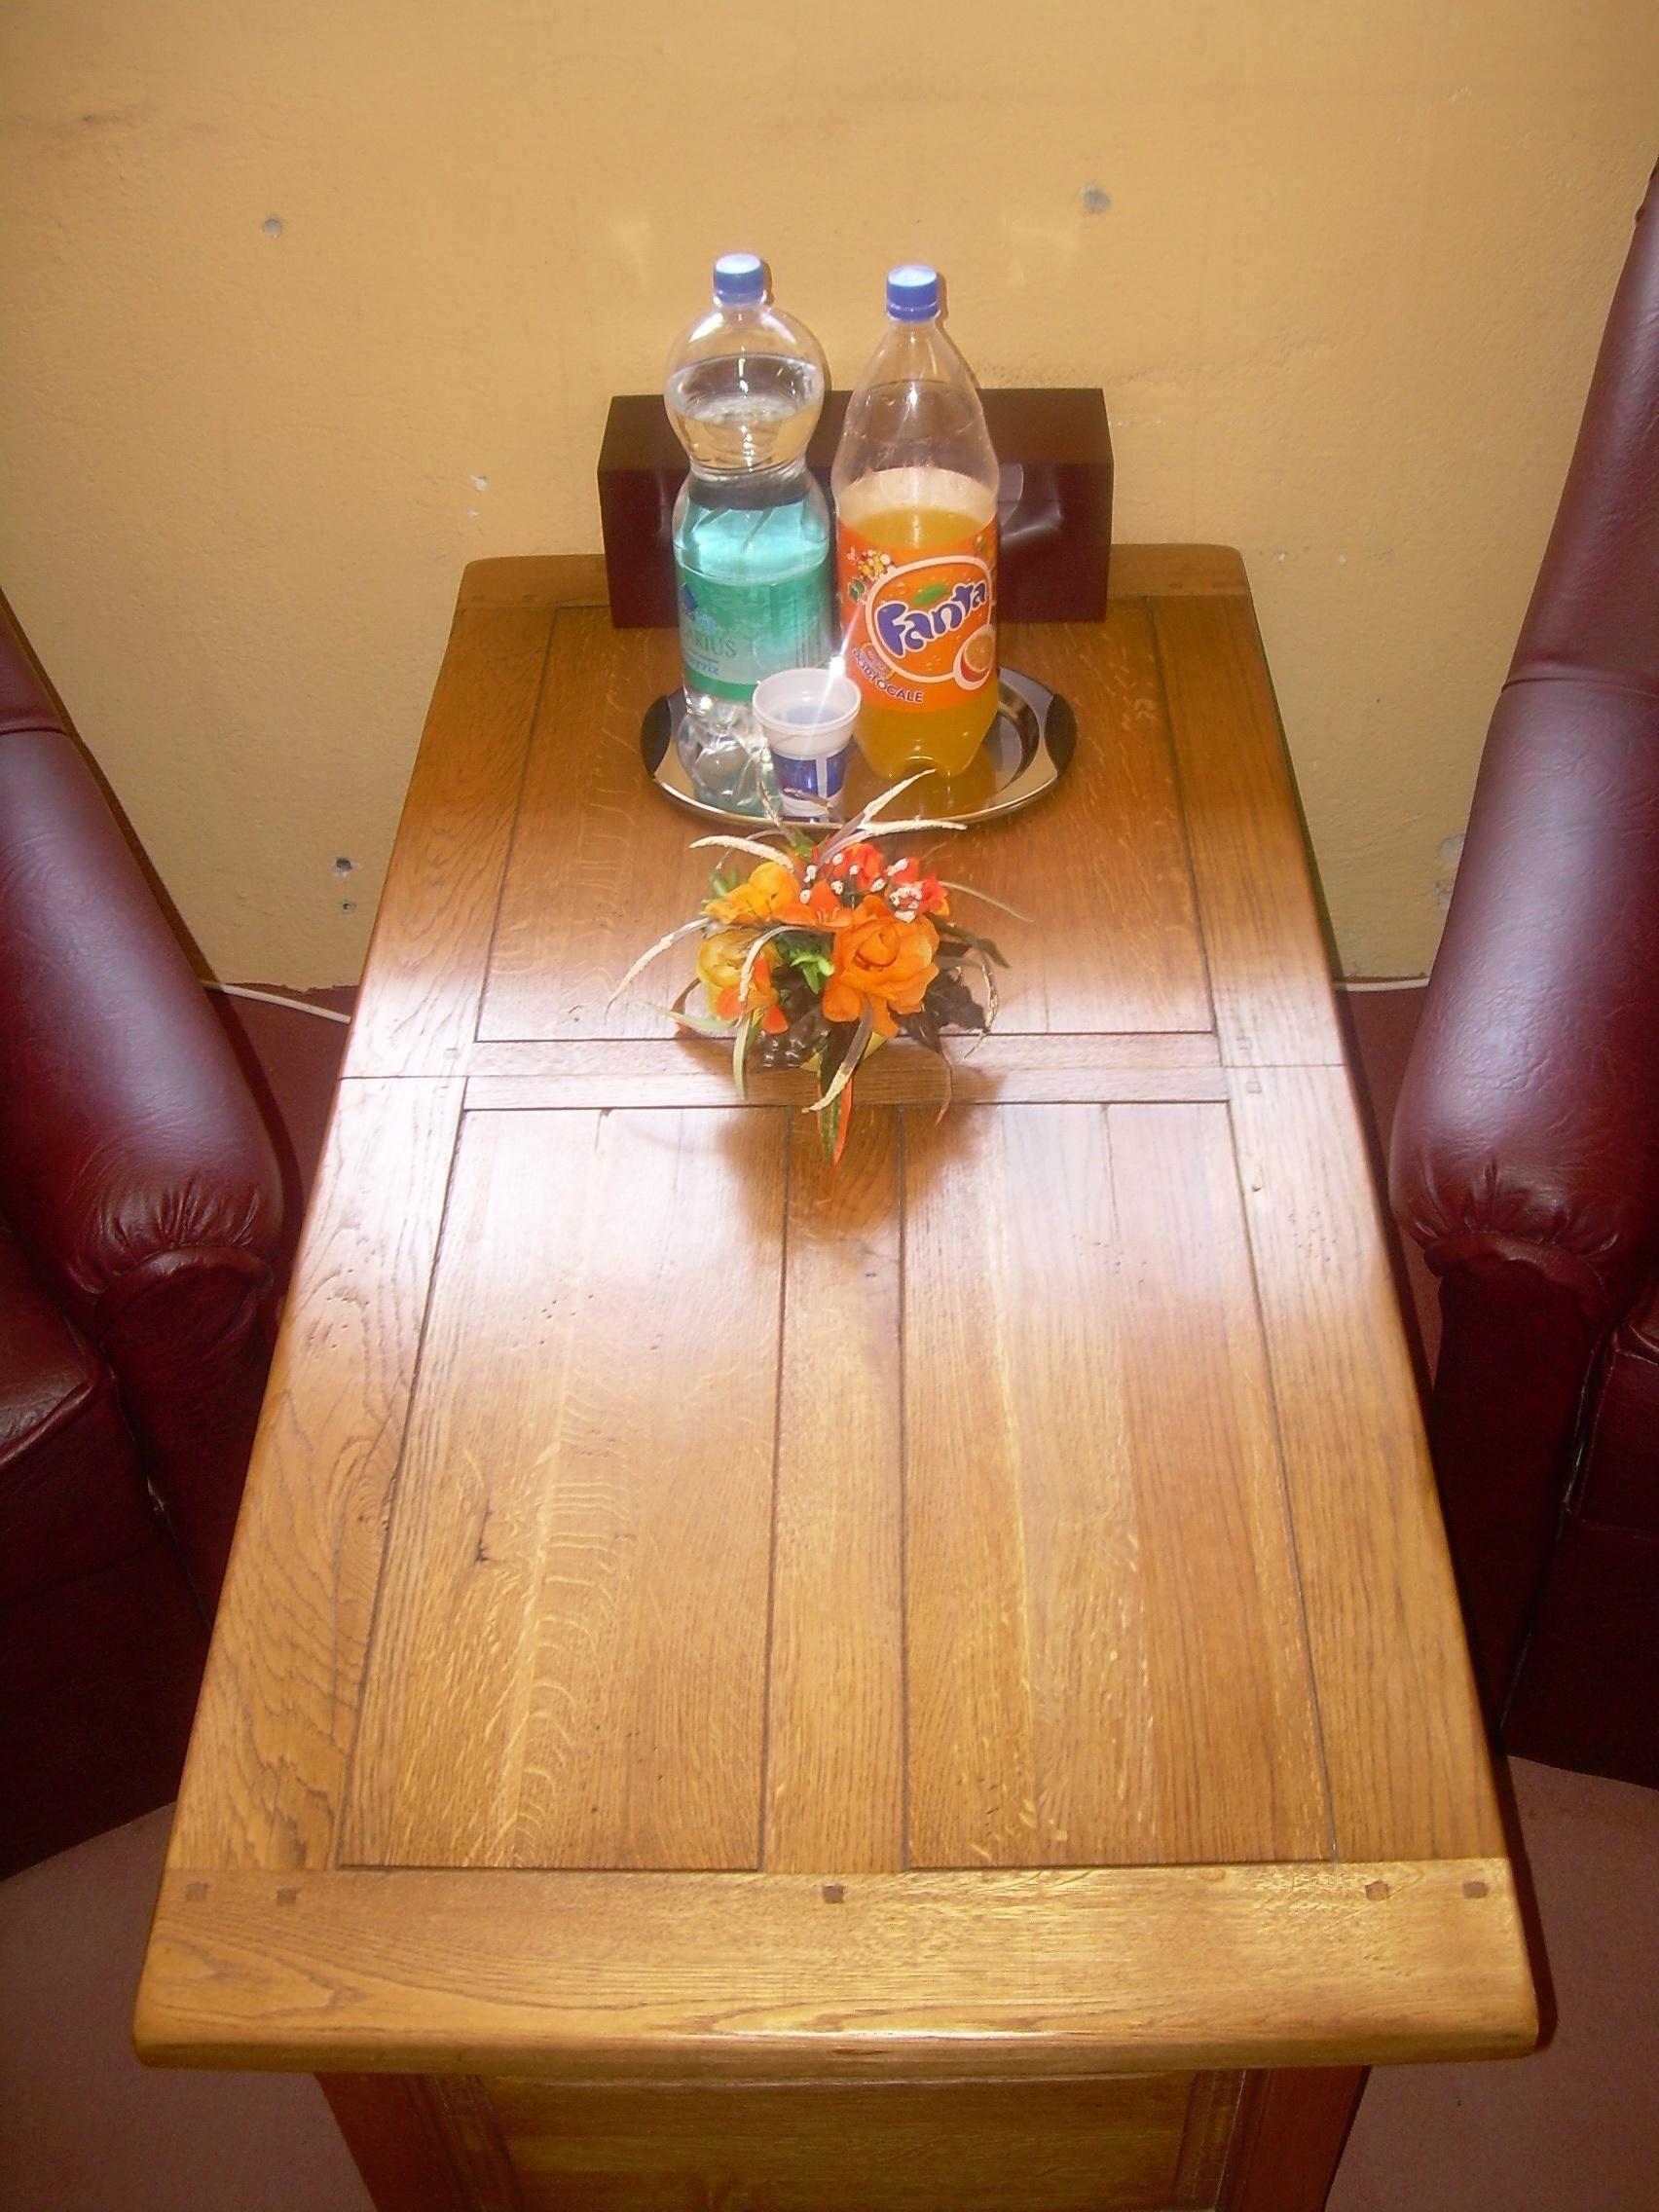 Tavoli da pranzo tradizionale 1 0 200 0 pezzi for Tavoli da pranzo a scomparsa